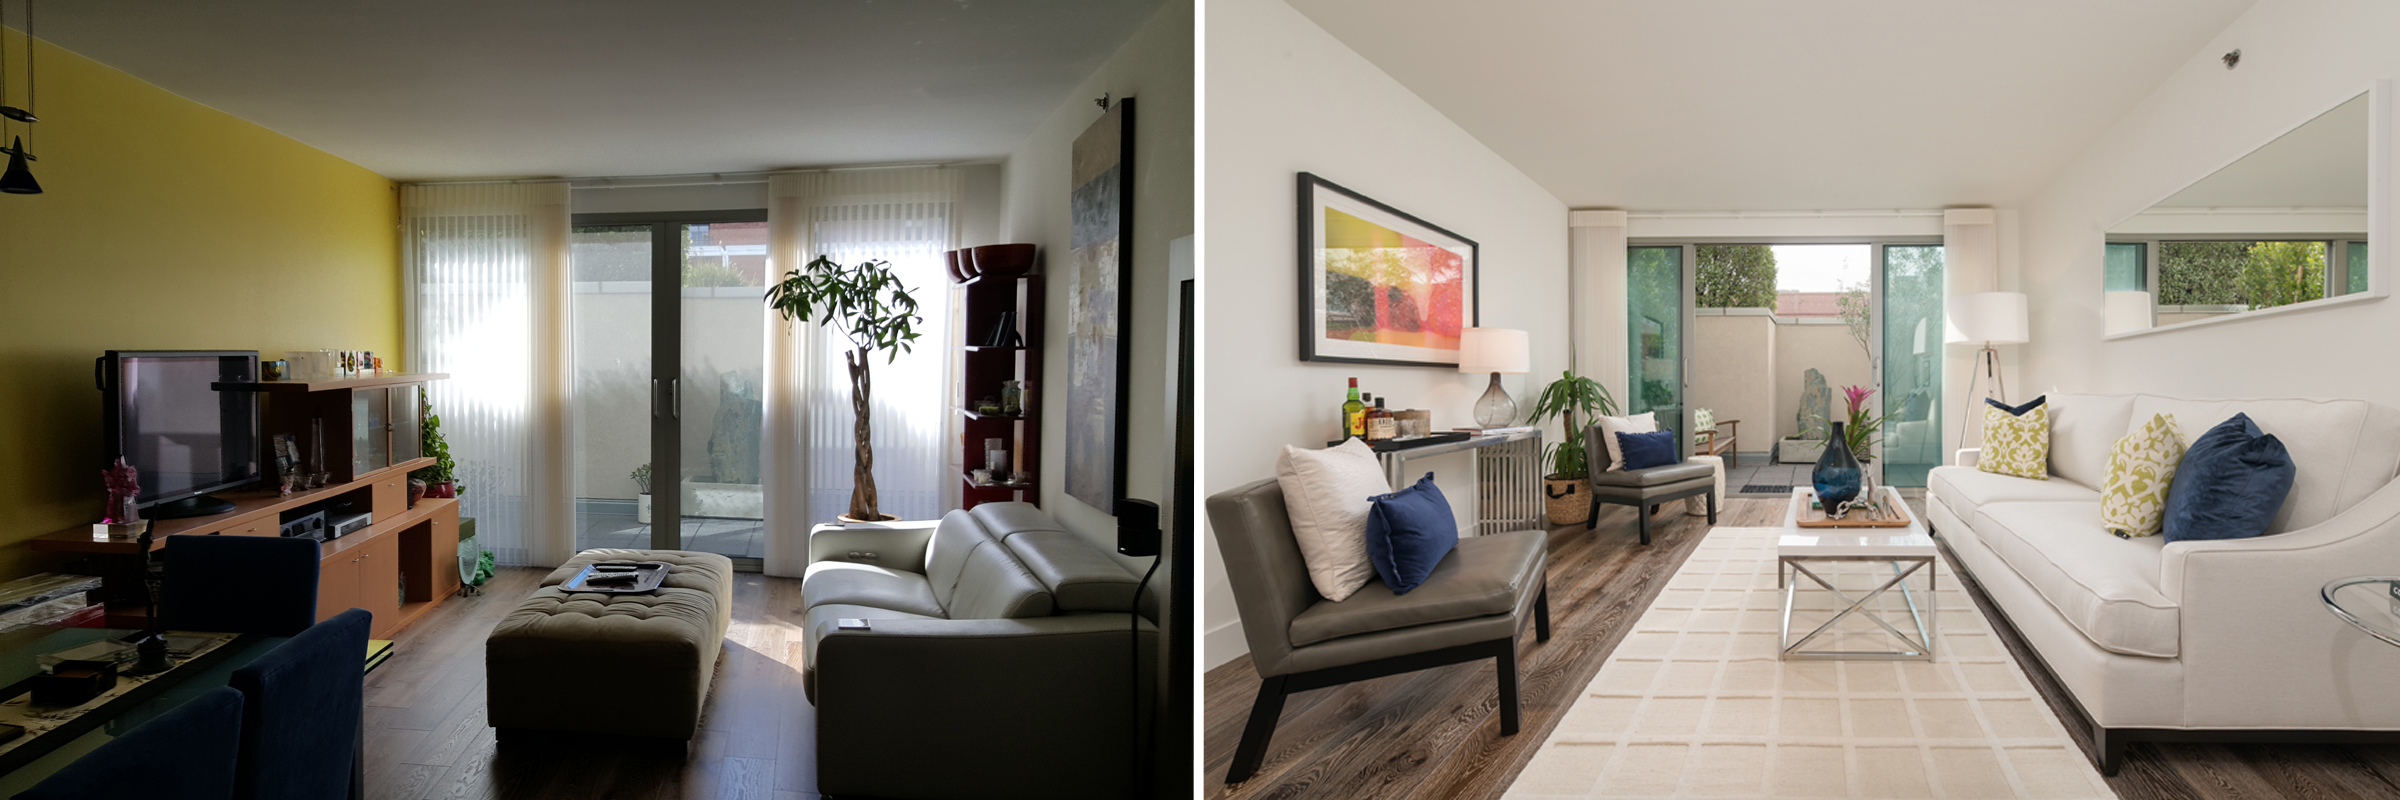 b+a 229 brannan 2g living room with line.jpg